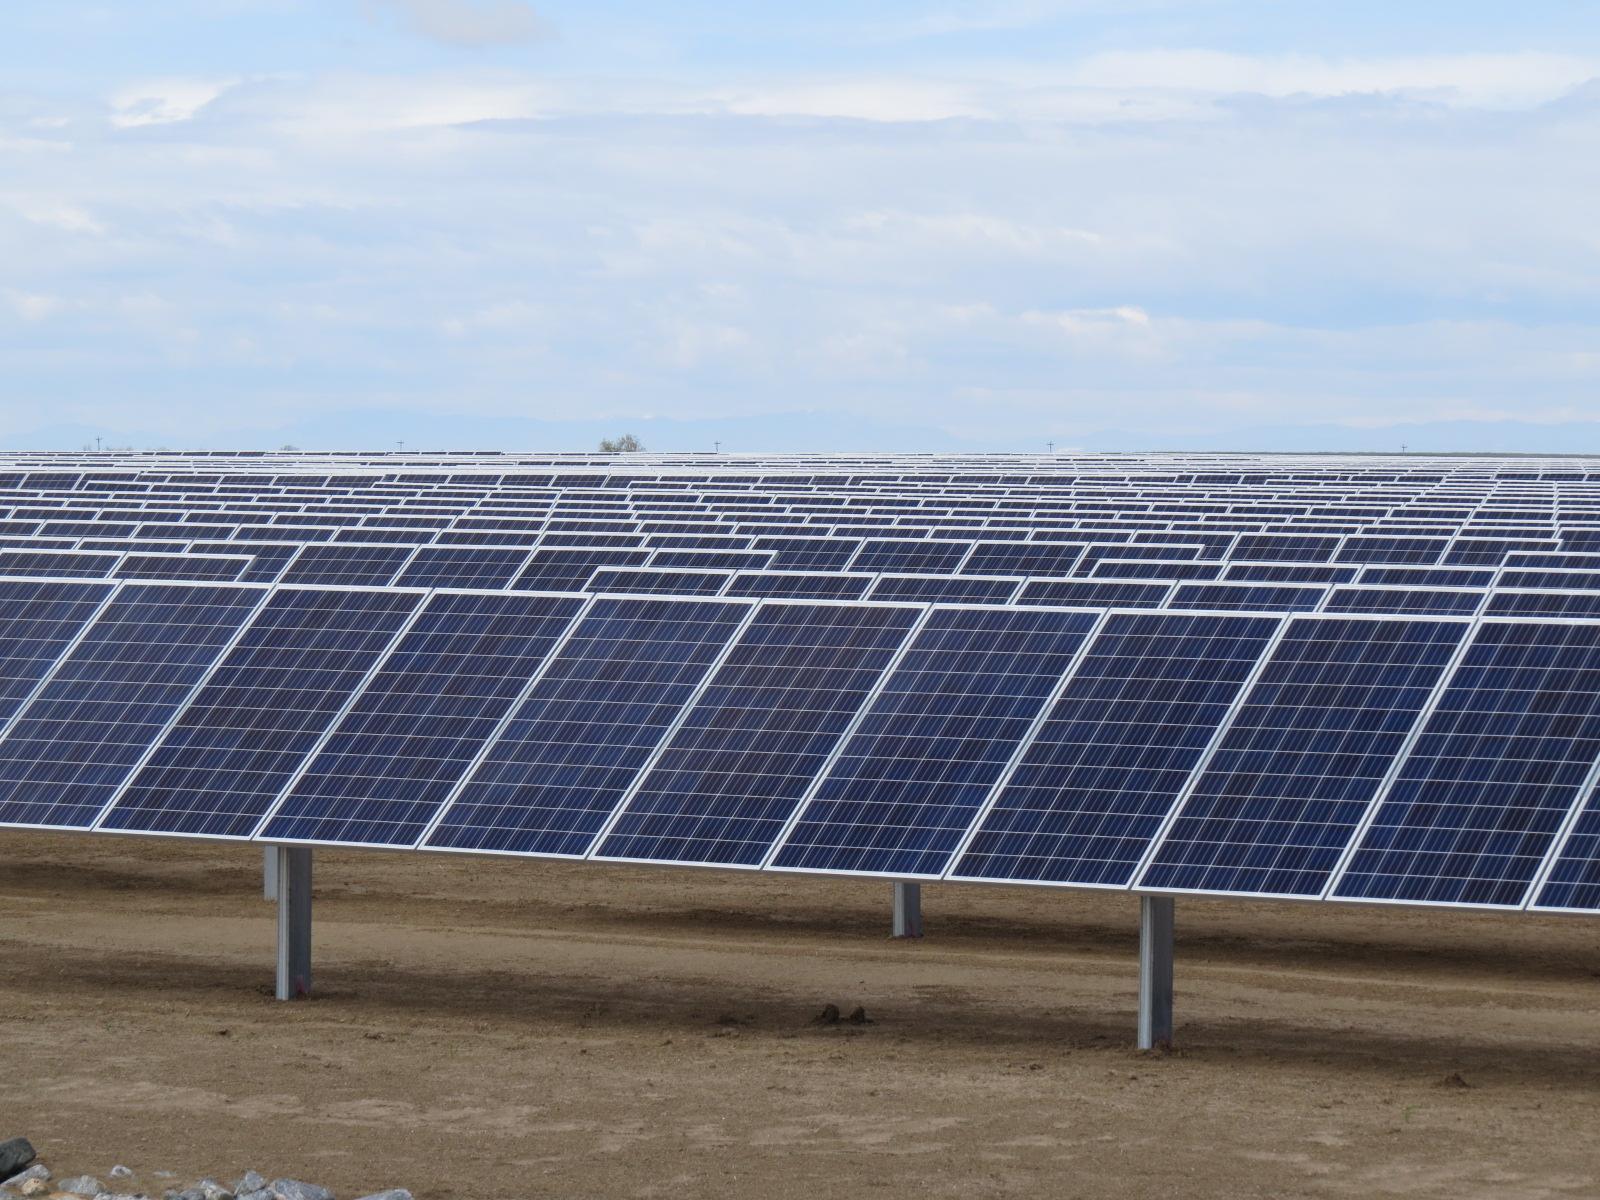 Victory Solar panels pic 13.JPG